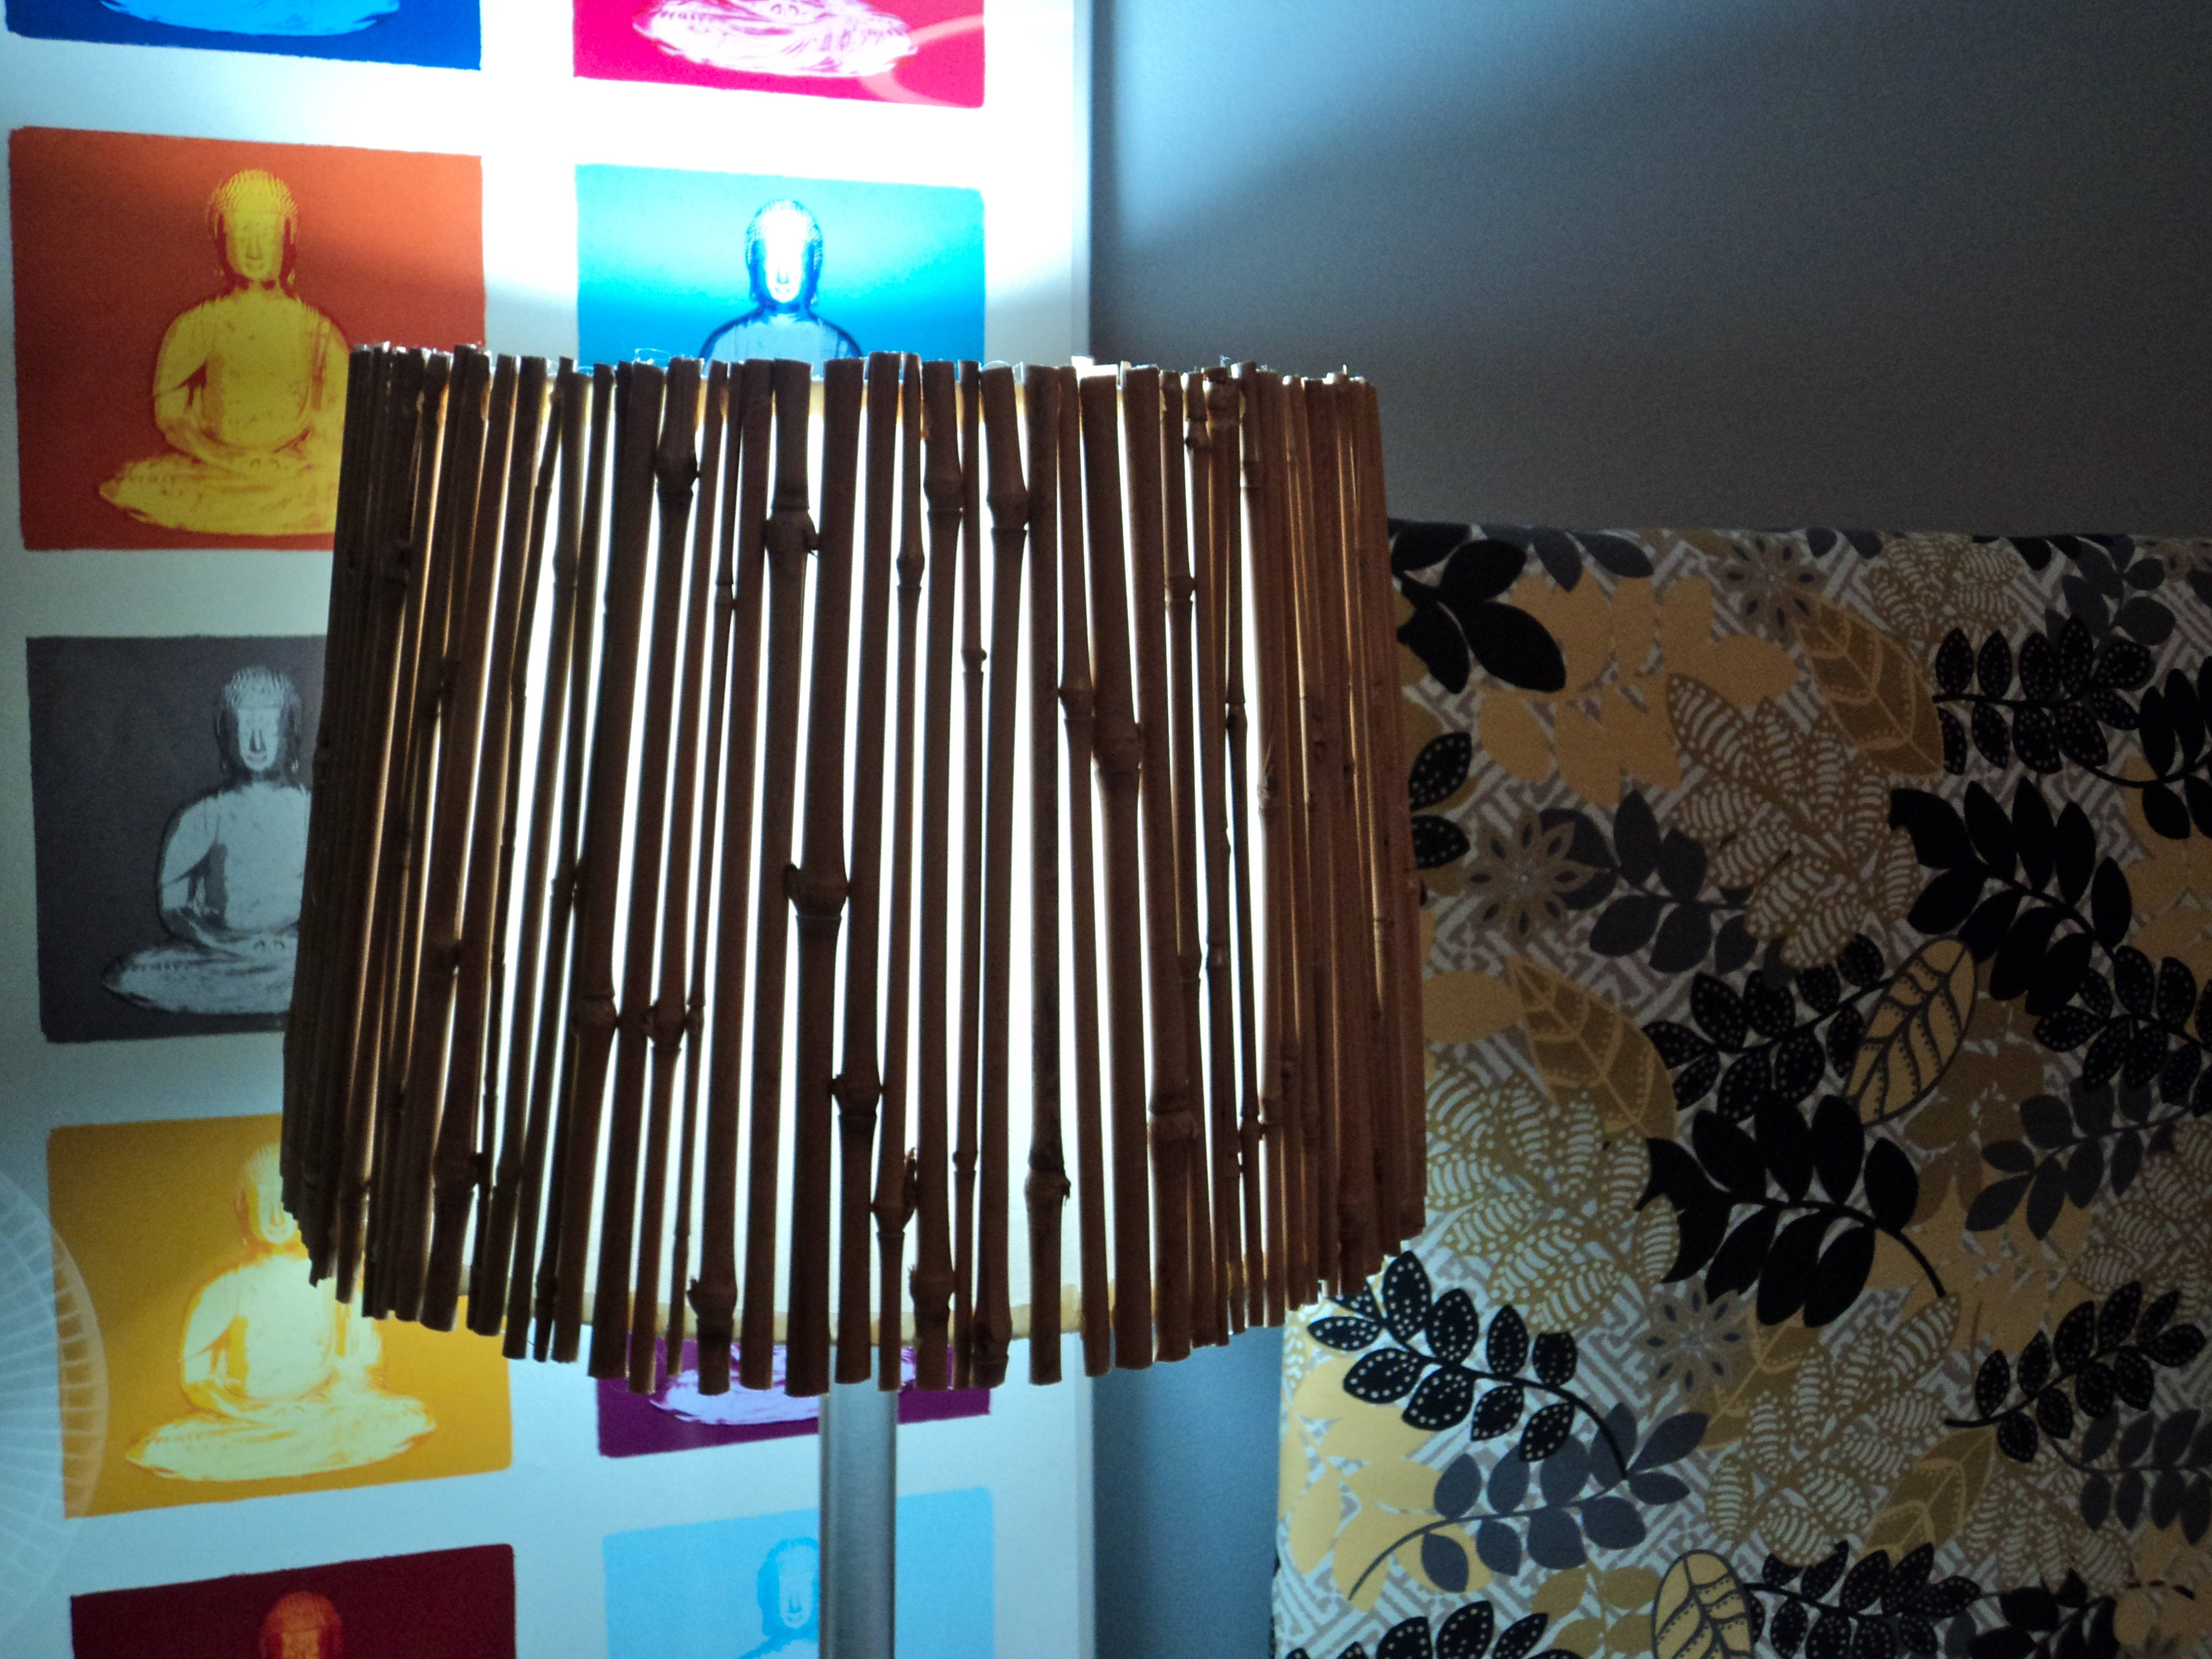 Macam-macam Kerajinan Tangan dari Bambu dan Cara Pembuatannya